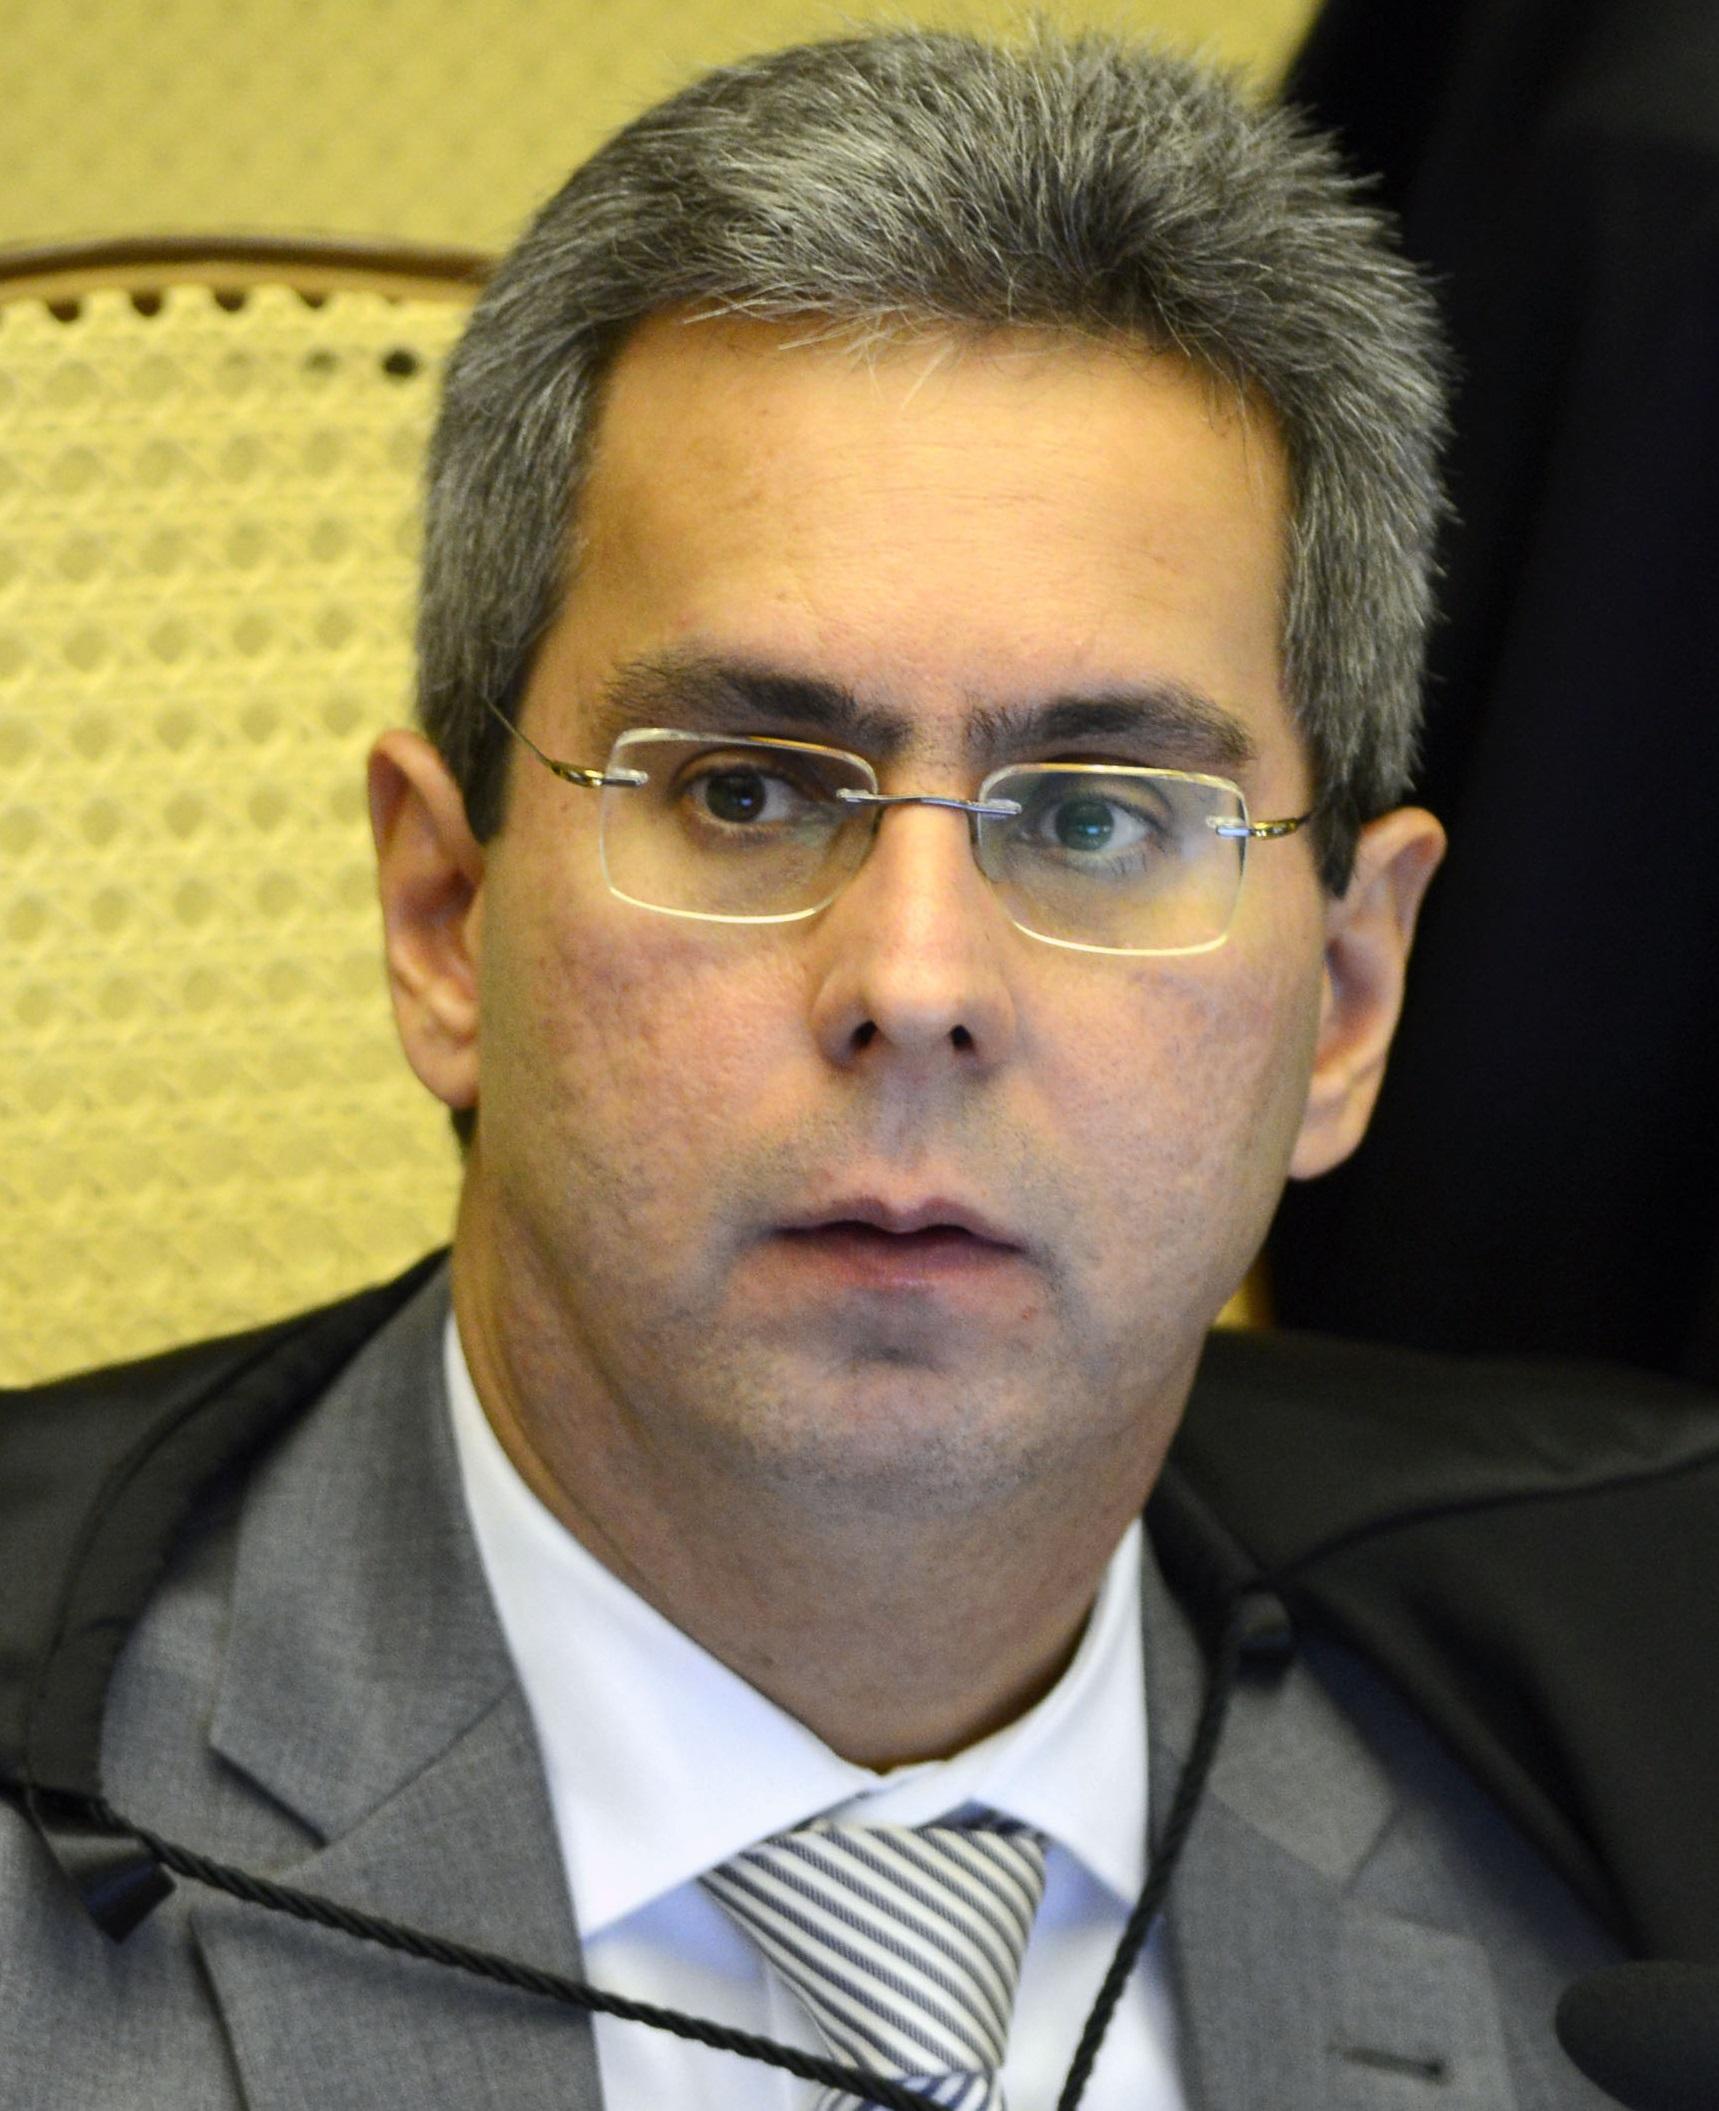 Veja o que saiu no Migalhas sobre Luiz Alberto Gurgel de Faria